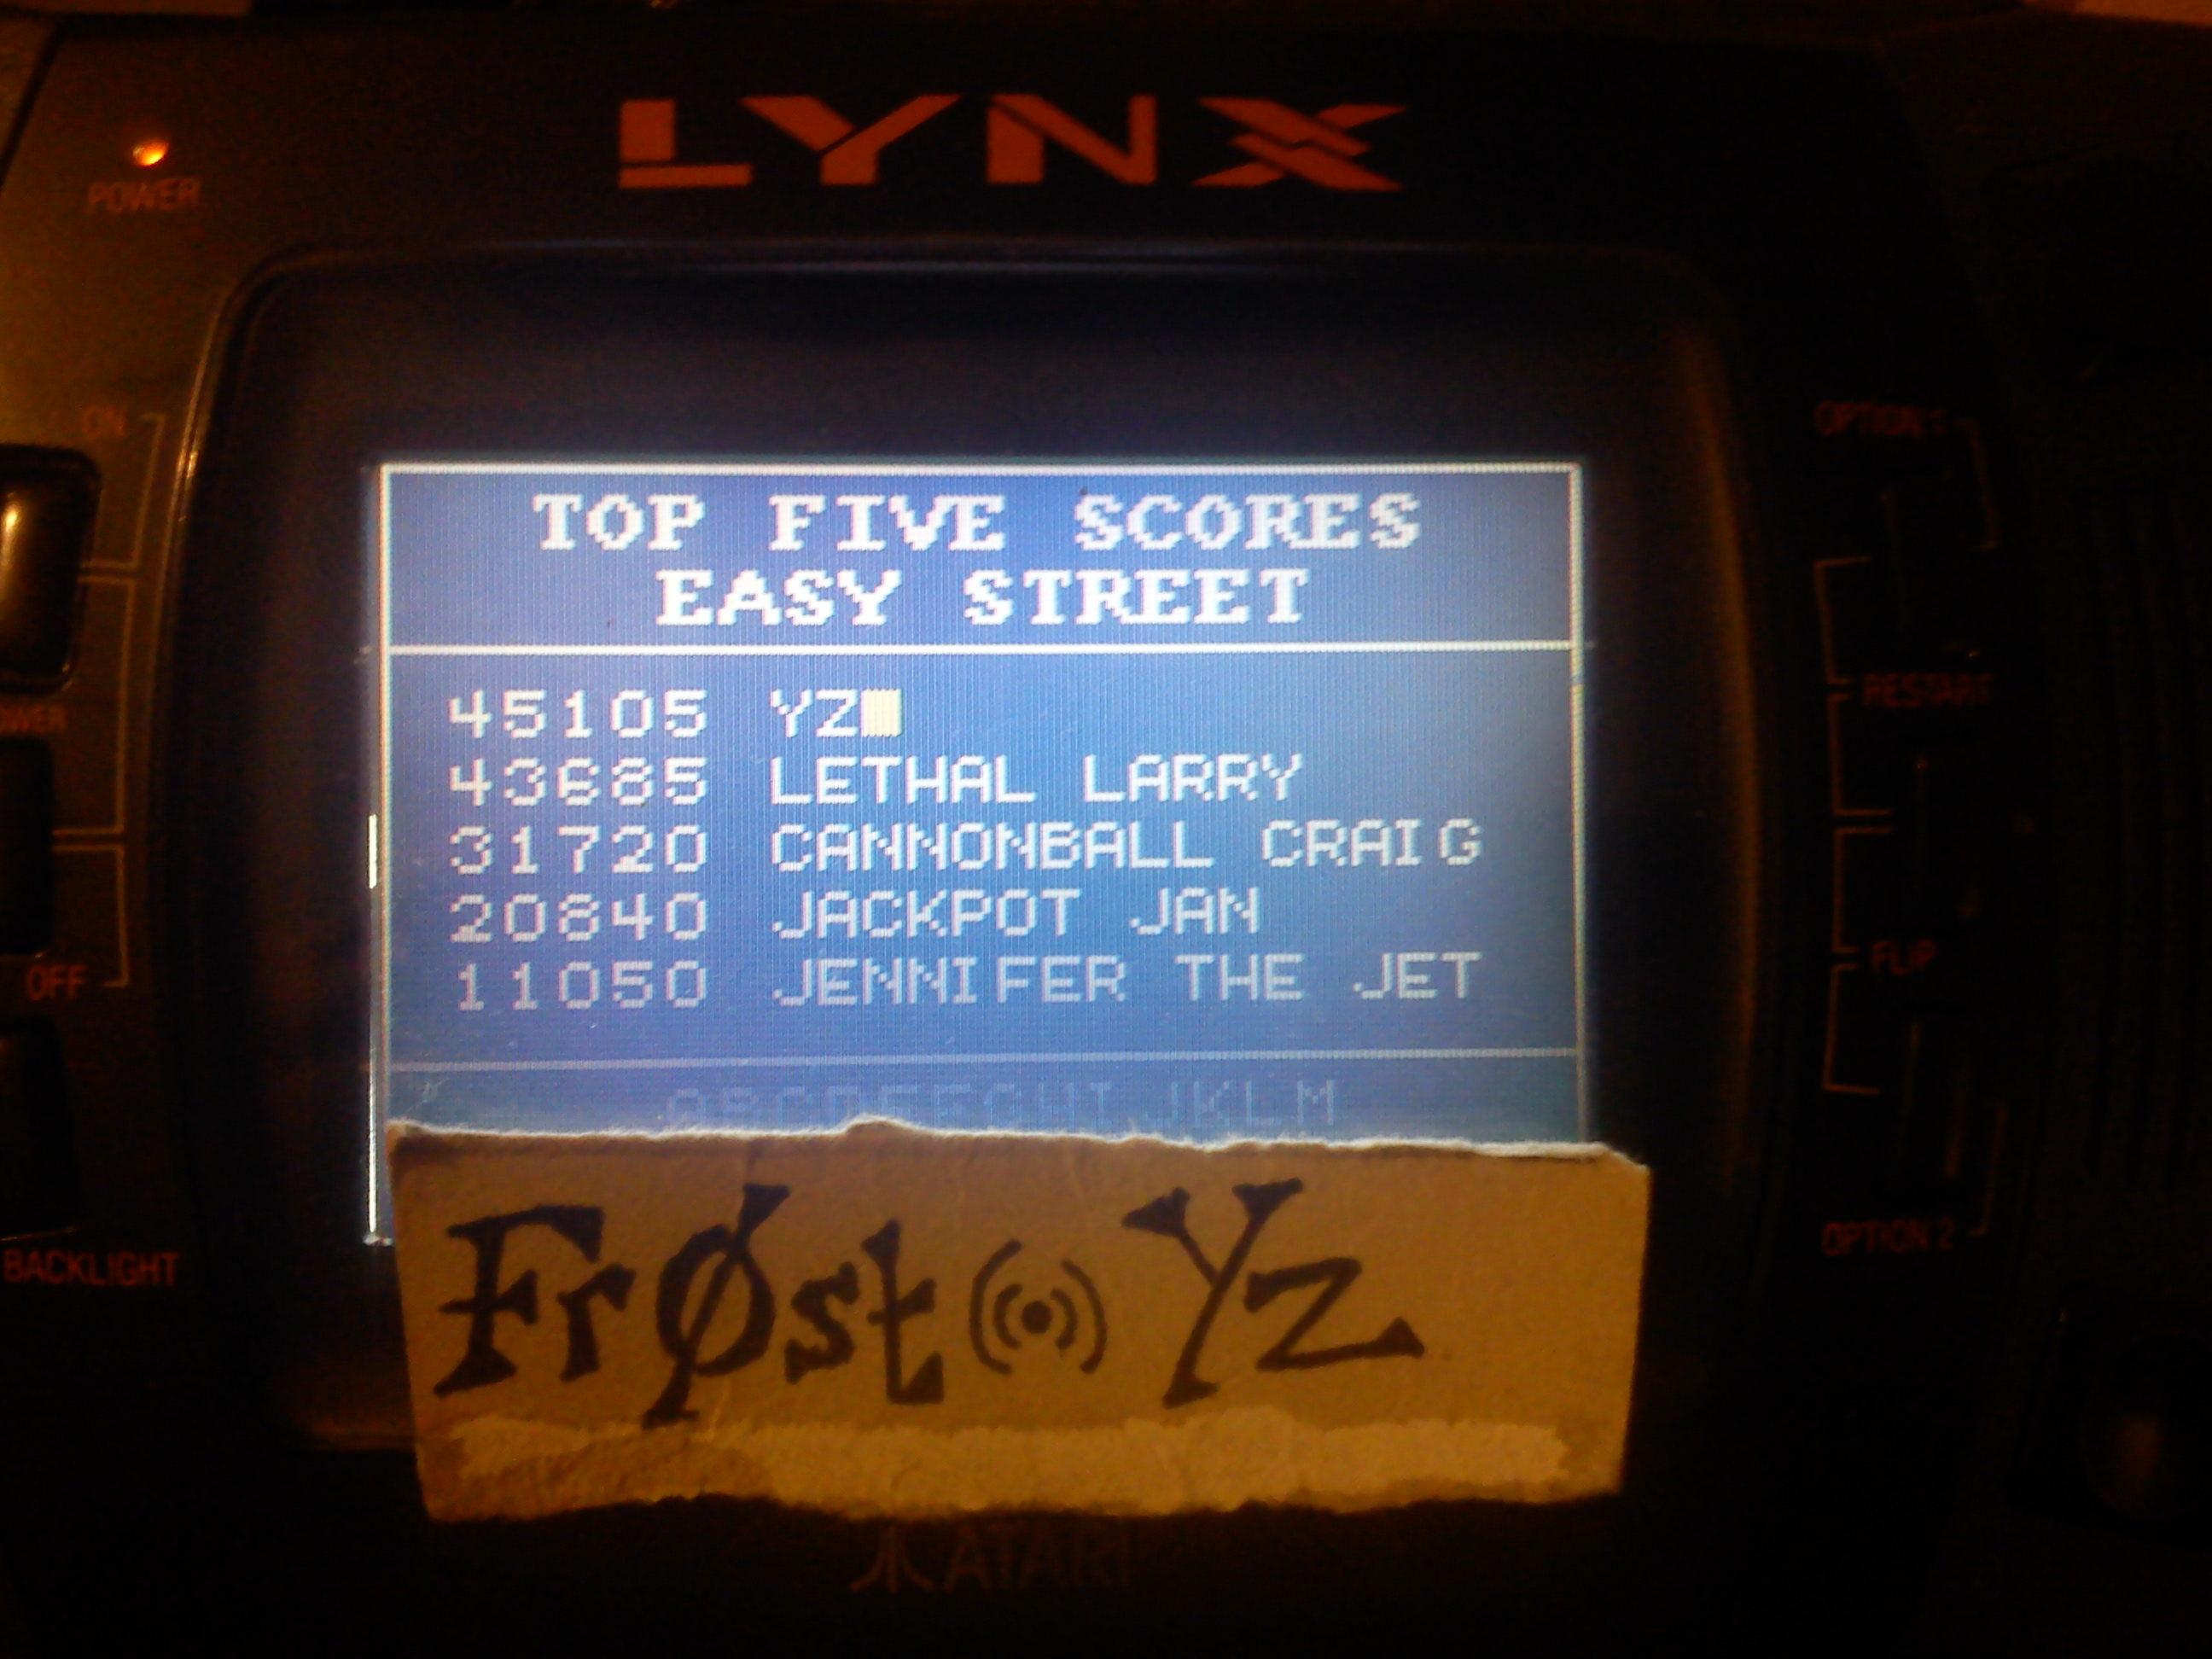 Fr0st: Paperboy: Easy Street (Atari Lynx) 45,105 points on 2014-11-04 13:30:59